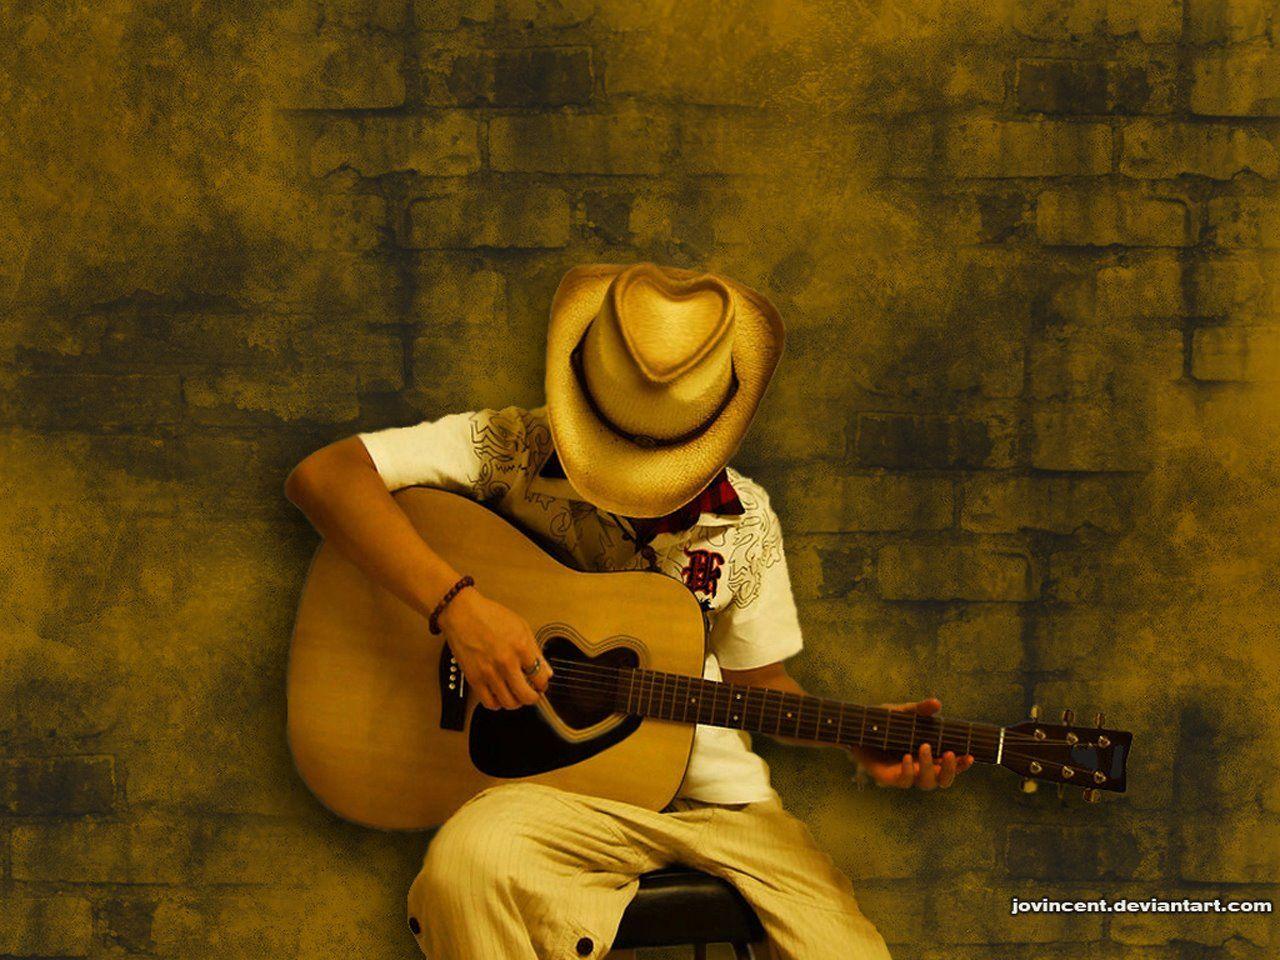 D Guitar Cell Phone Wallpapers Phones Hd Wallpaper 2560 1440 3d Guitar Wallpapers 49 Wallpapers Adorable Wallpapers Muzykalnye Oboi Licemer Citaty